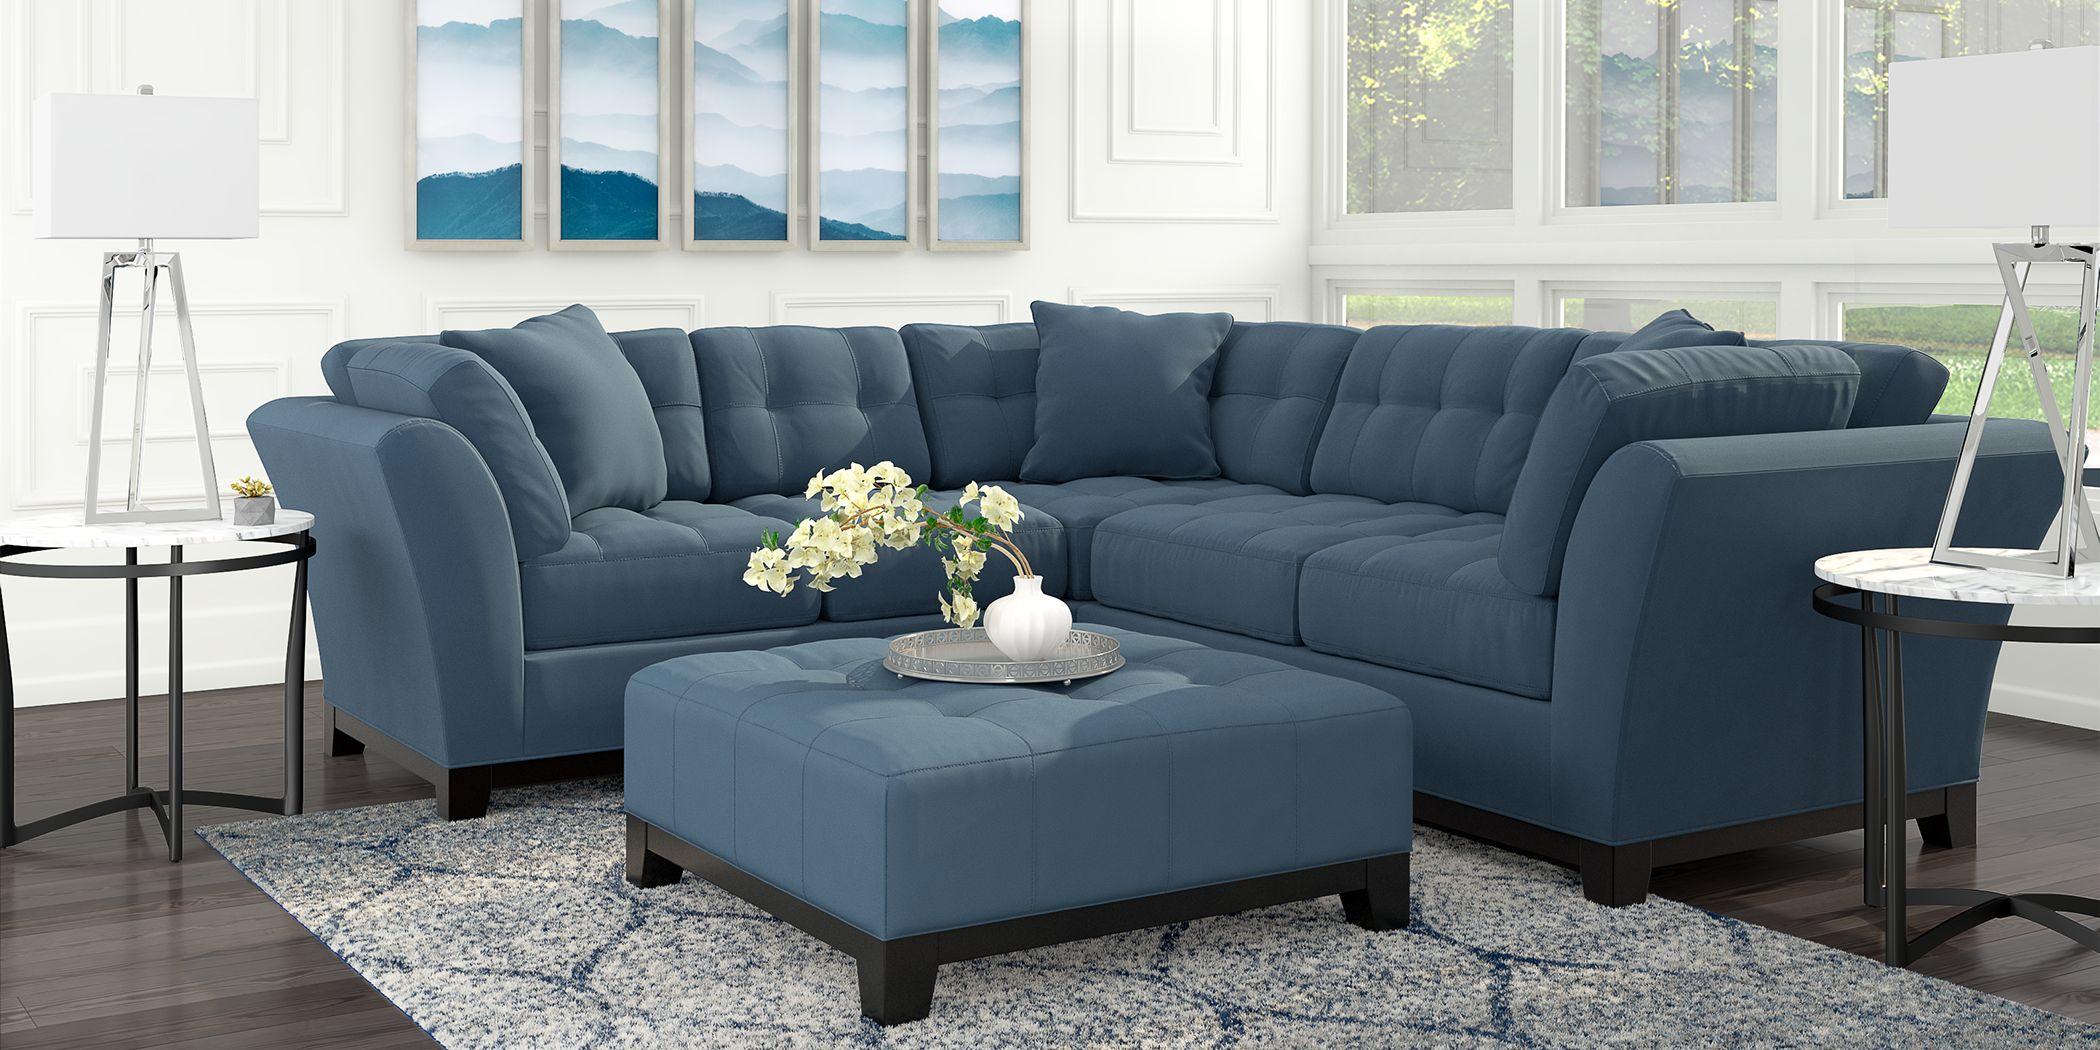 Cindy Crawford Home Metropolis Indigo 3 Pc Sectional Living Room